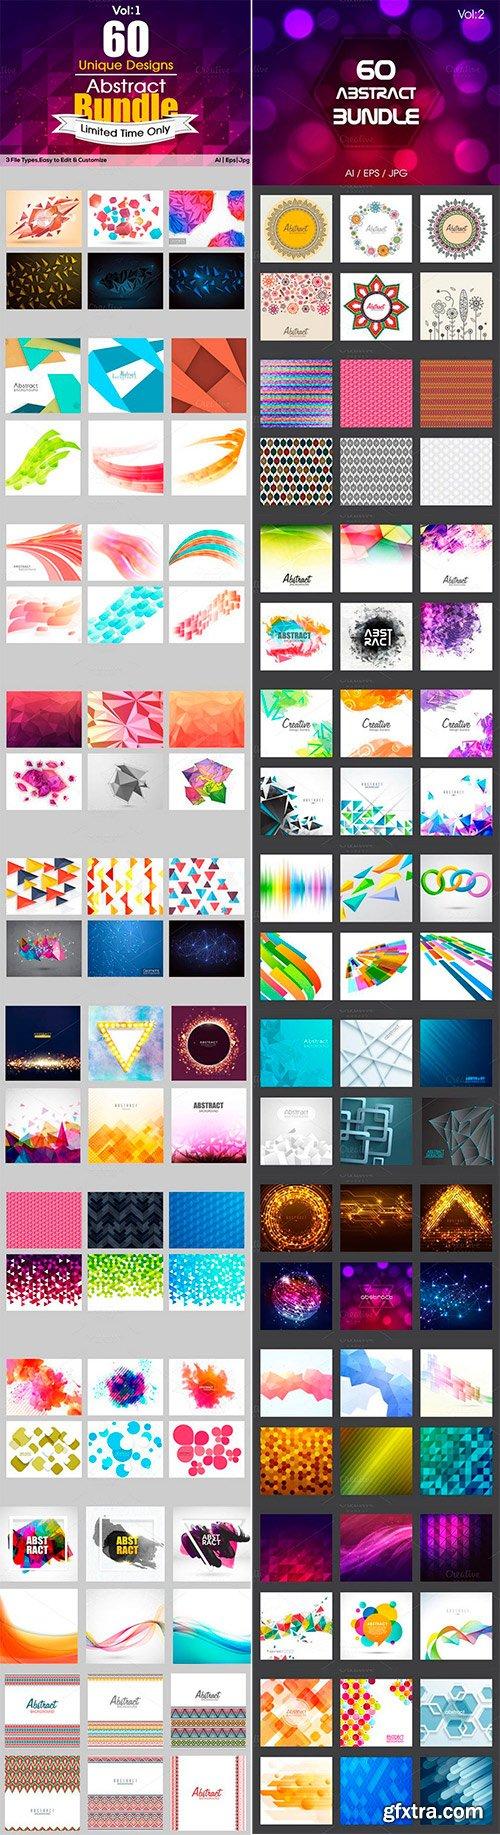 Creative Abstract Bundle